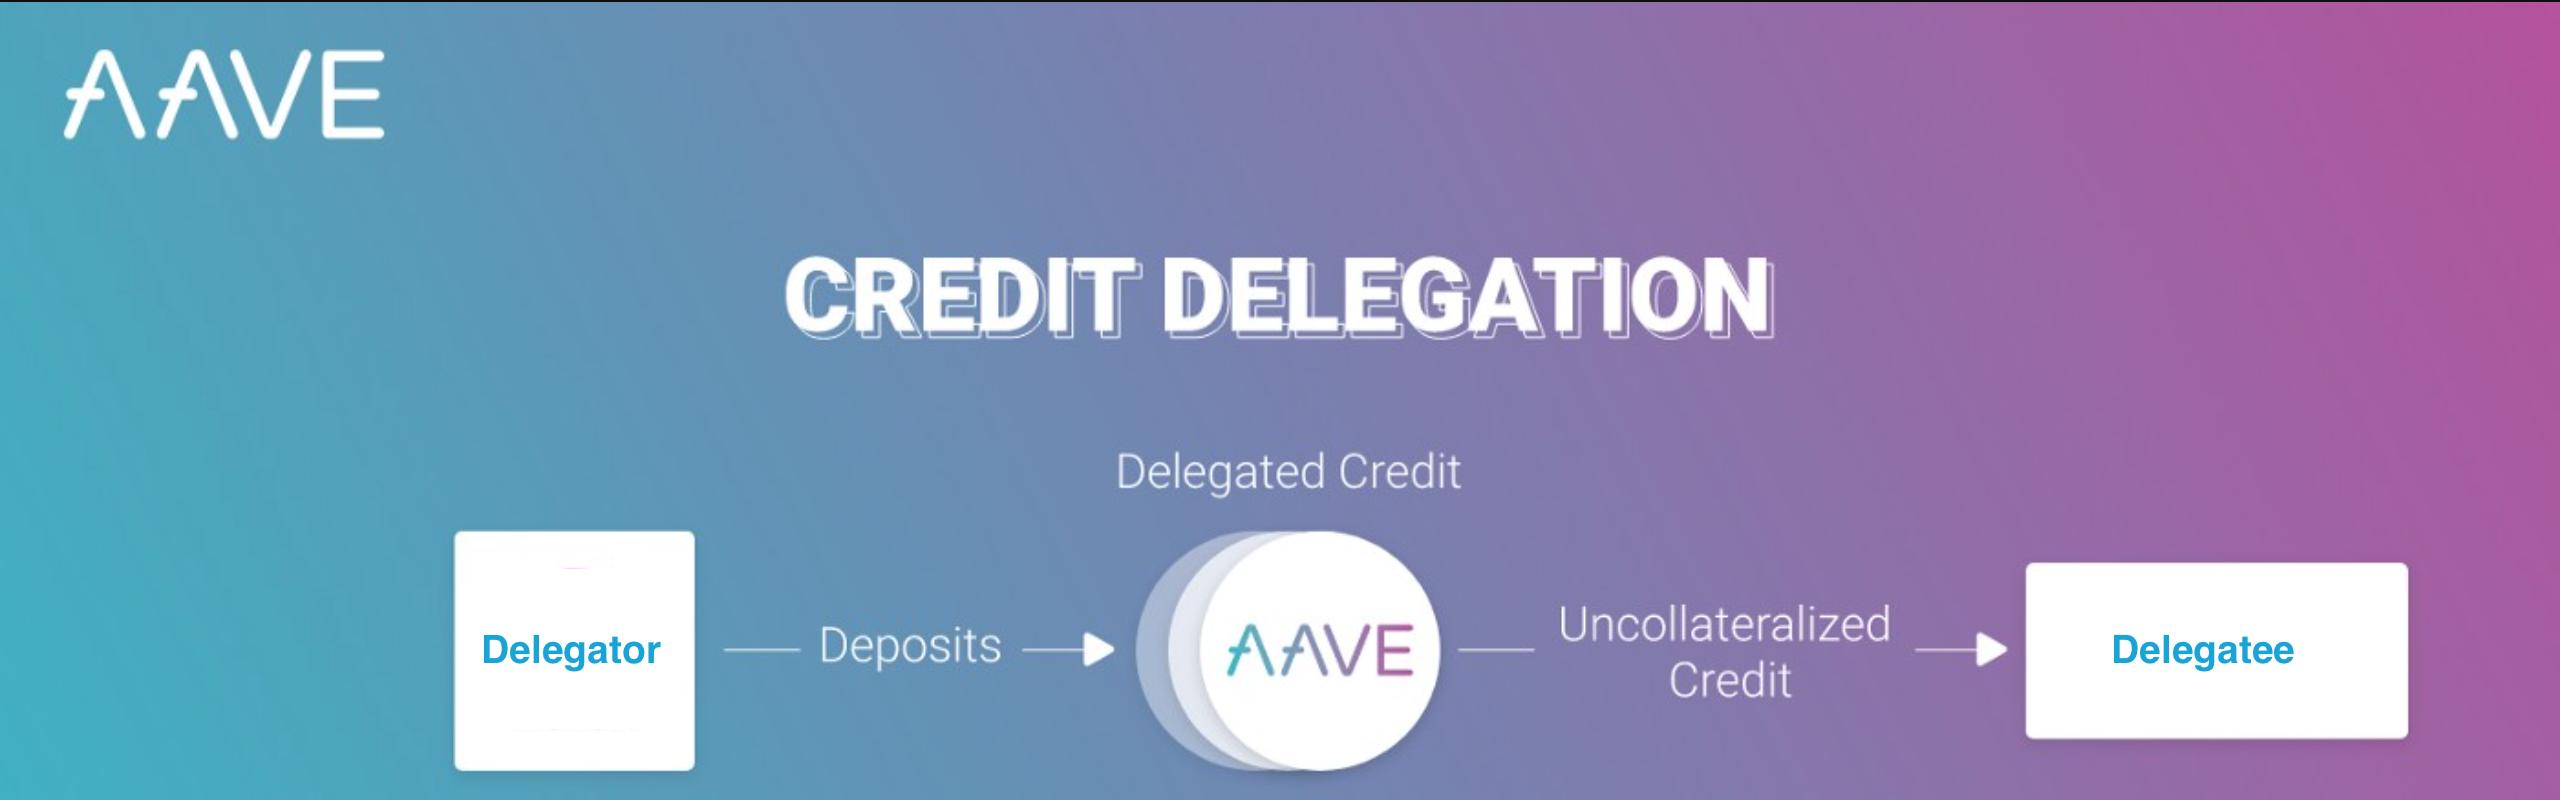 Aave Credit Delegation showcase